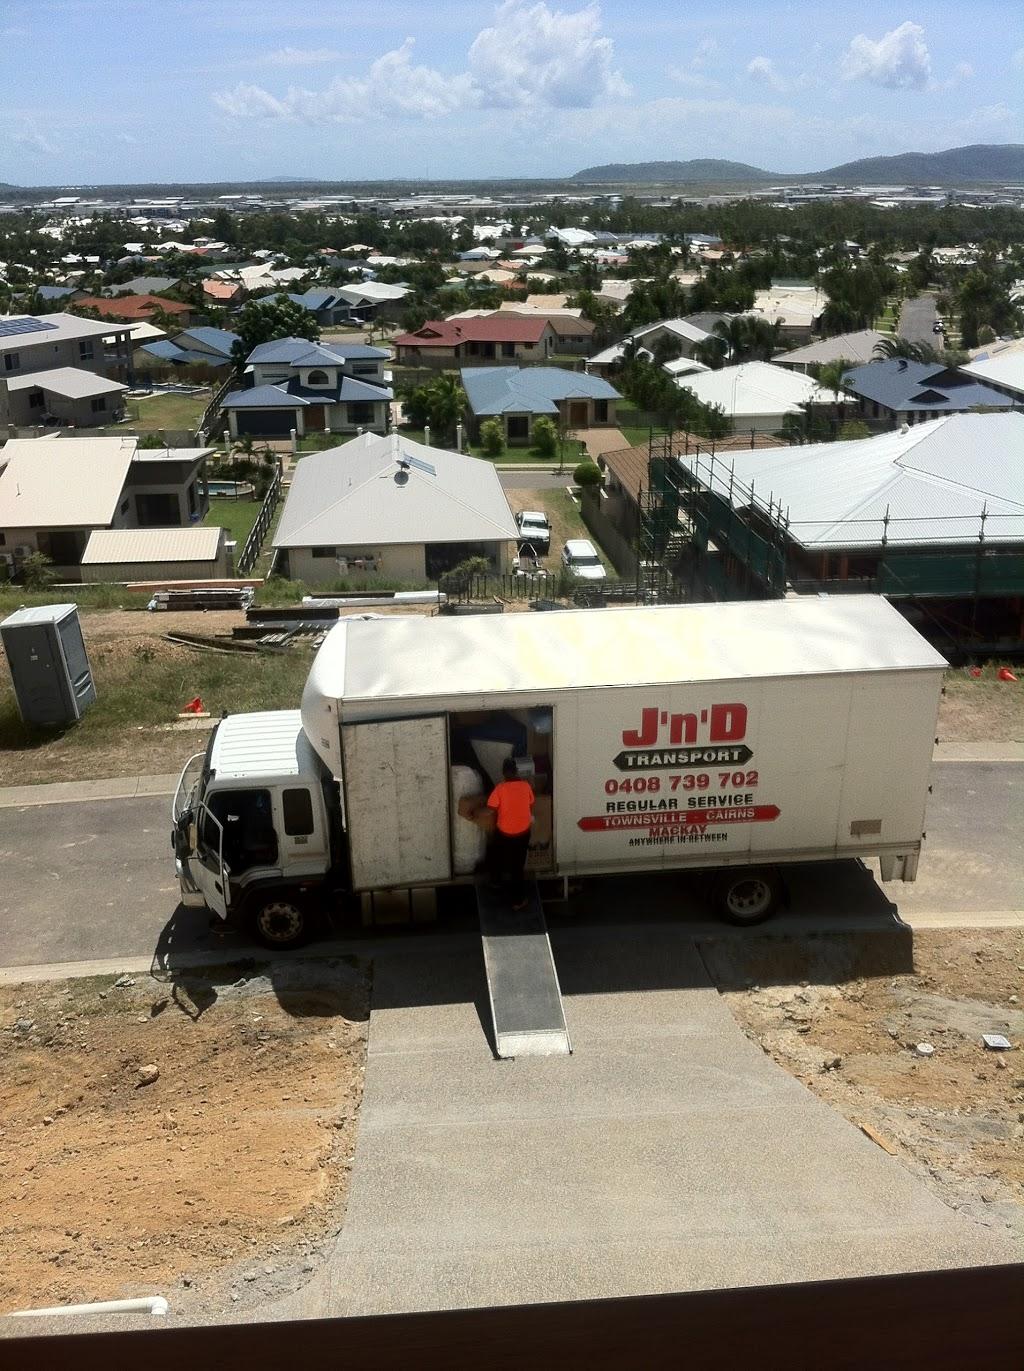 JND Removals & Transport | moving company | 19a Margaret St, West End QLD 4810, Australia | 0408739702 OR +61 408 739 702